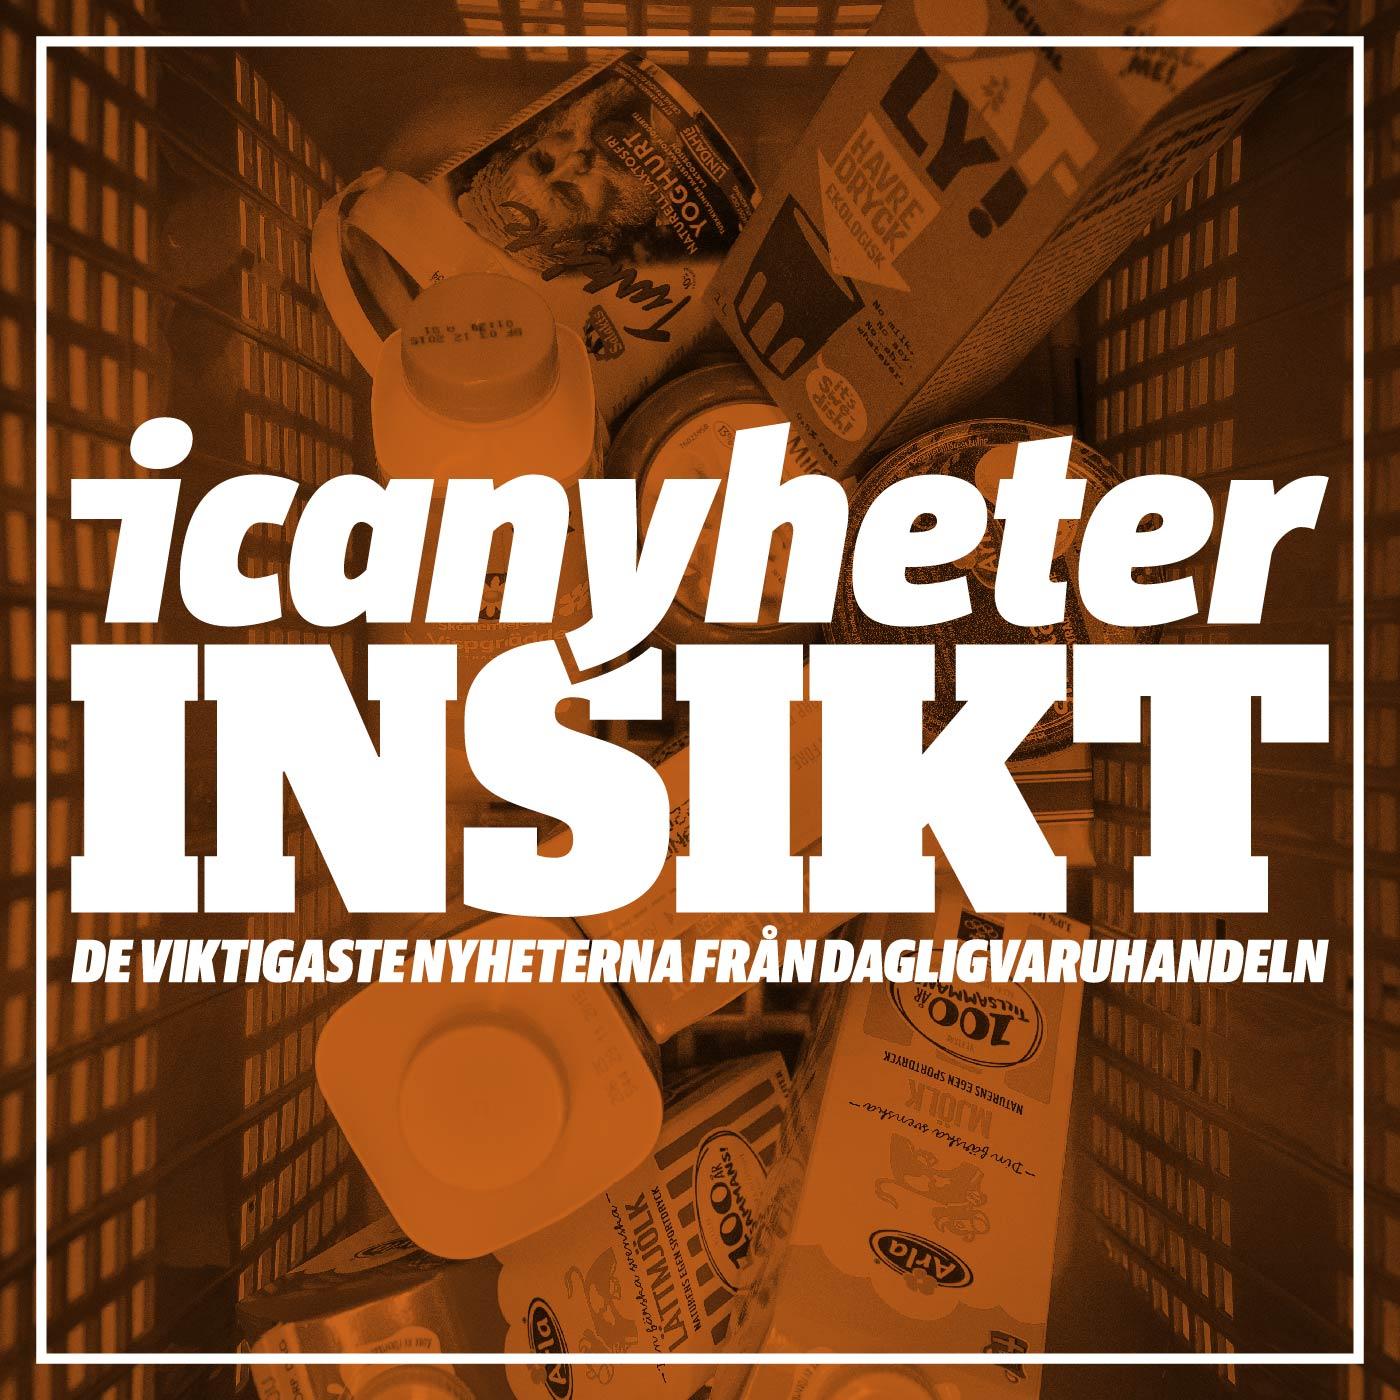 icanyheter INSIKT show art